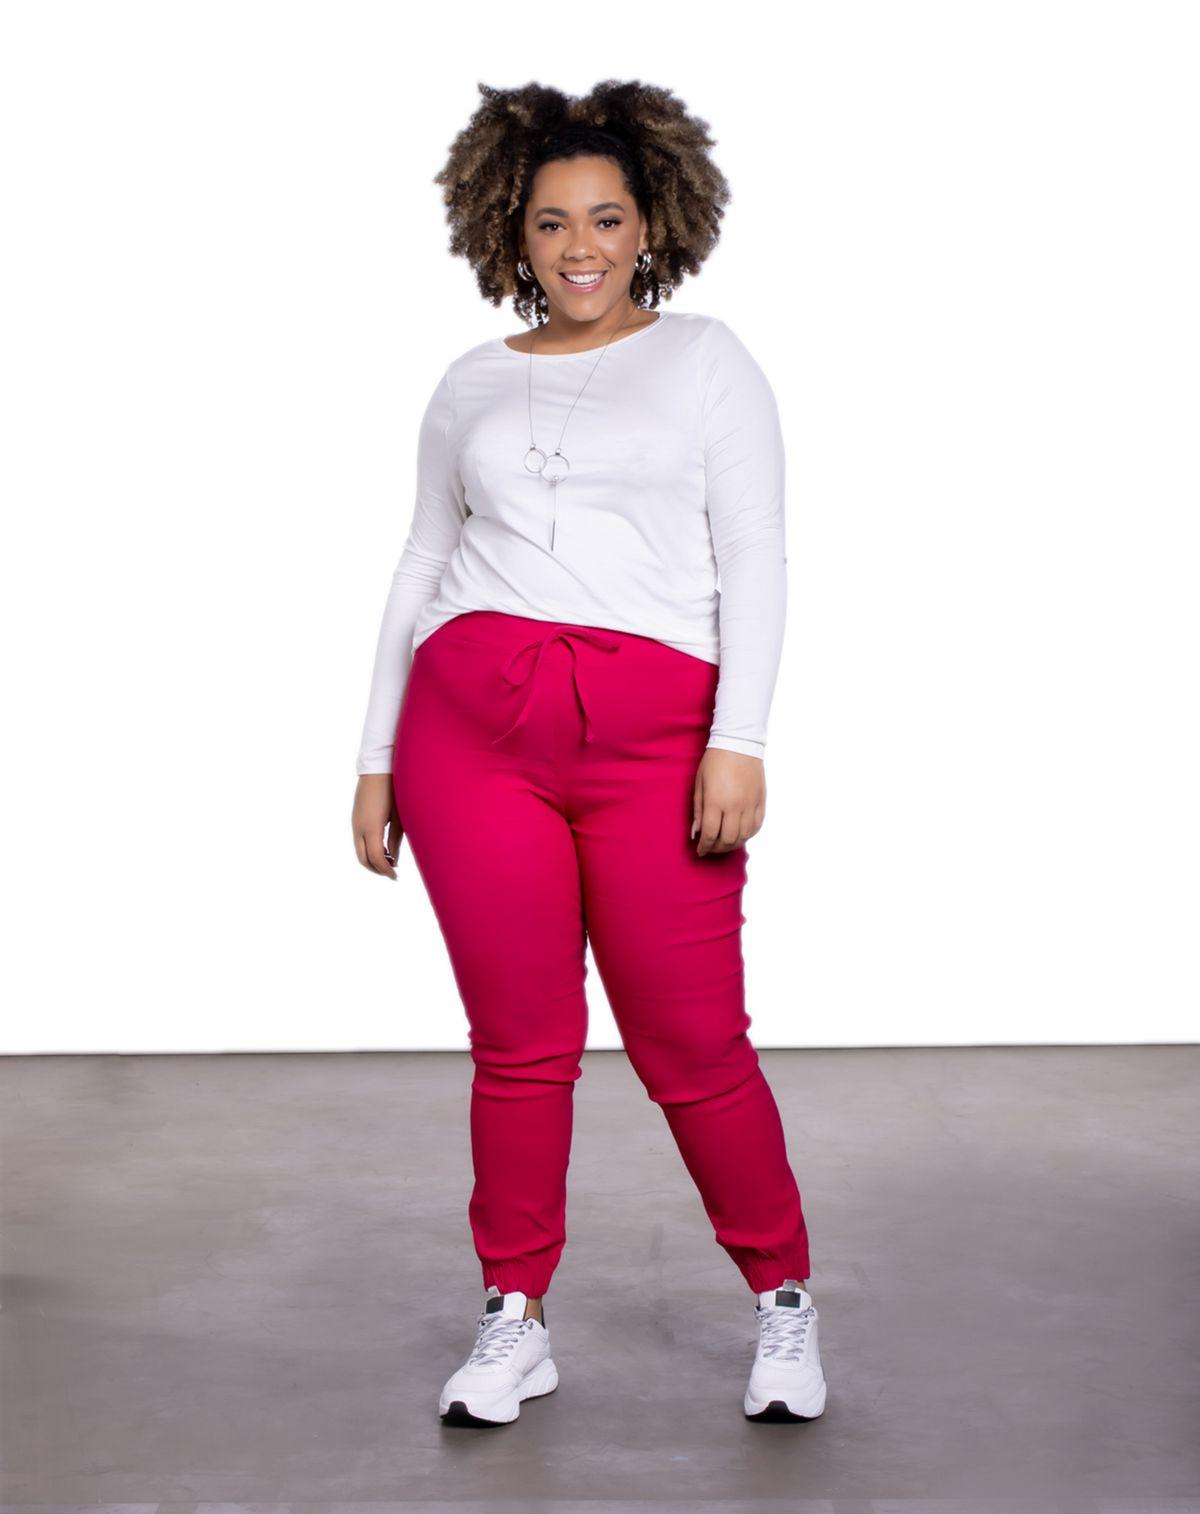 565856010-calca-jogger-bengaline-plus-feminina-pink-g2-c57